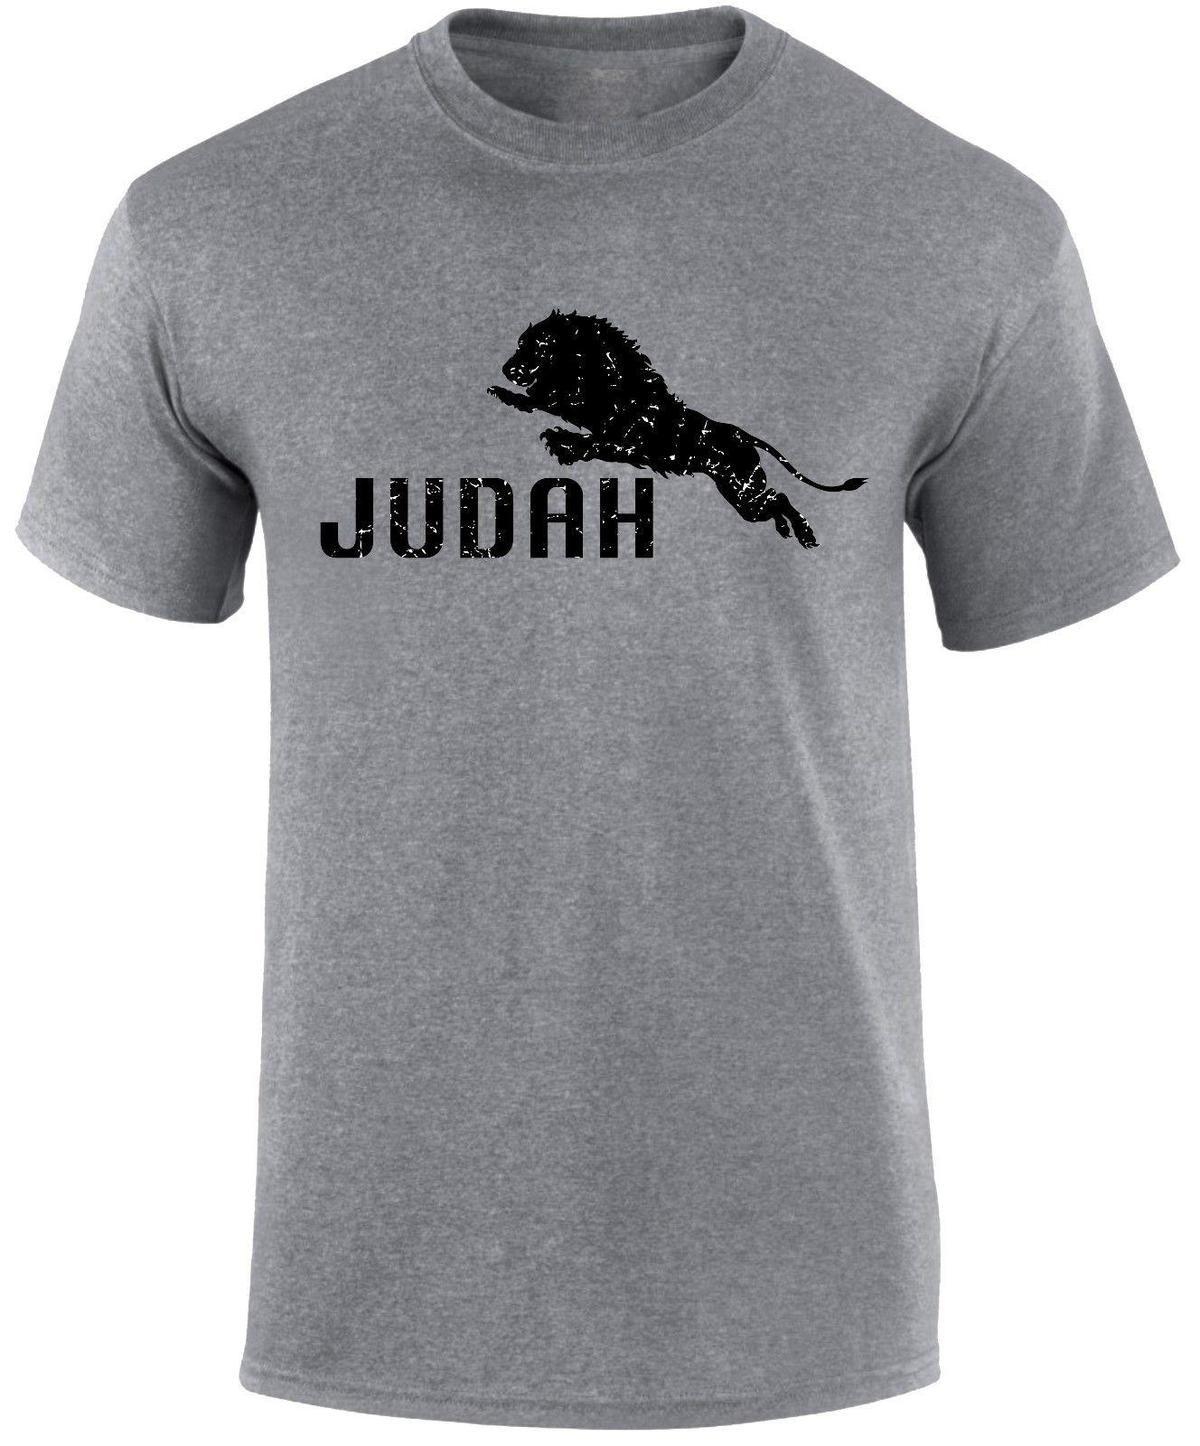 6504ae6f Jesus The Lion Of Judah Religious Gospel Slogan Jewish Christian Men T  Shirt Shirt T Shirt Tee From Yubin9, $14.67| DHgate.Com